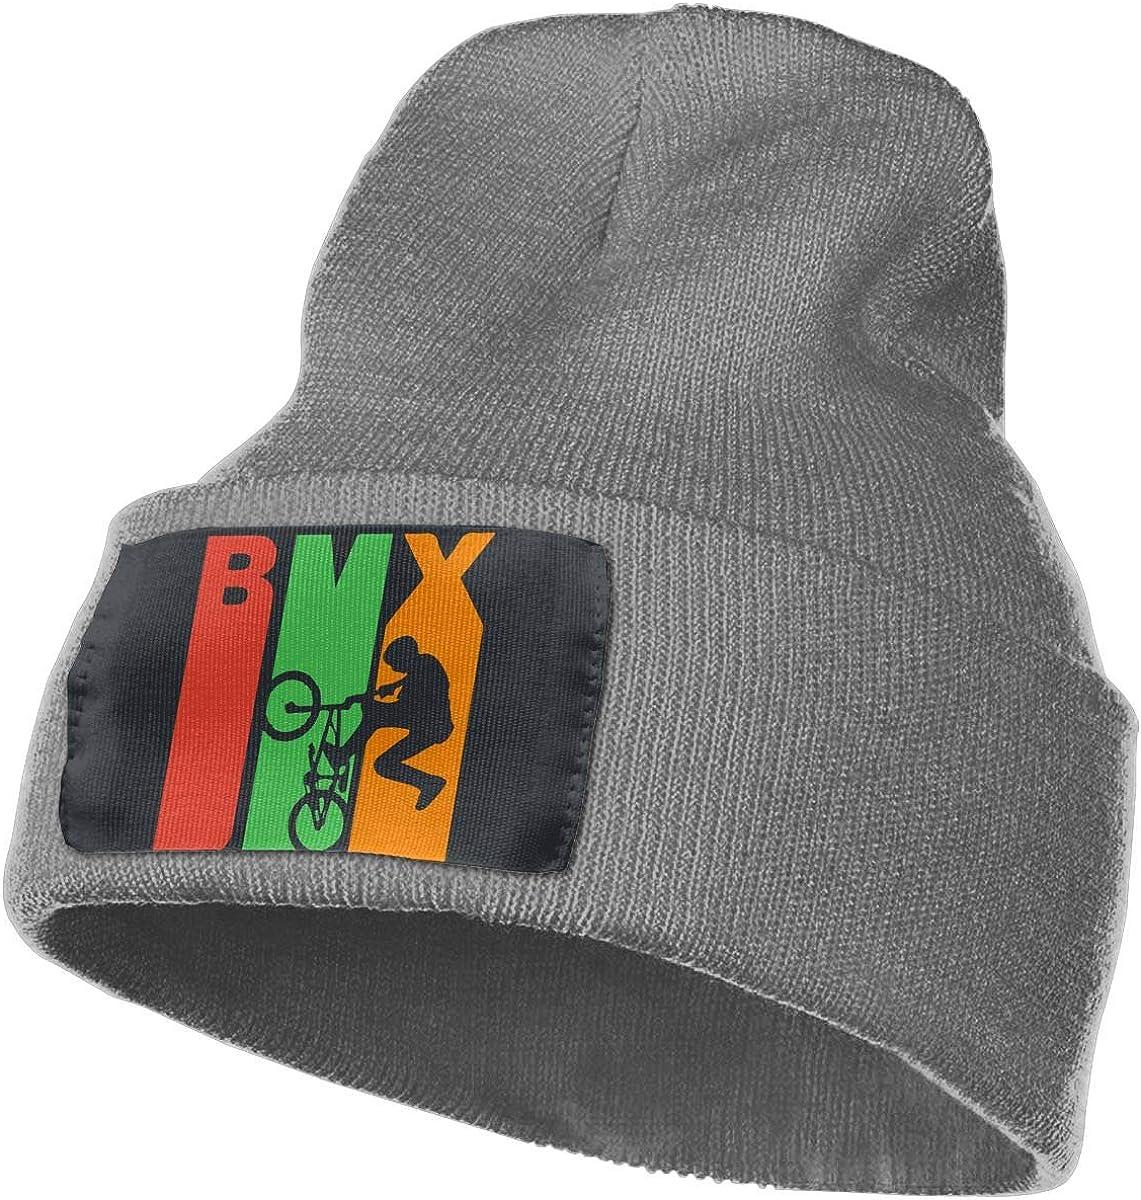 Retro 1970s Style BMX Silhouette Unisex Winter Comfortable Snow Ski Hat